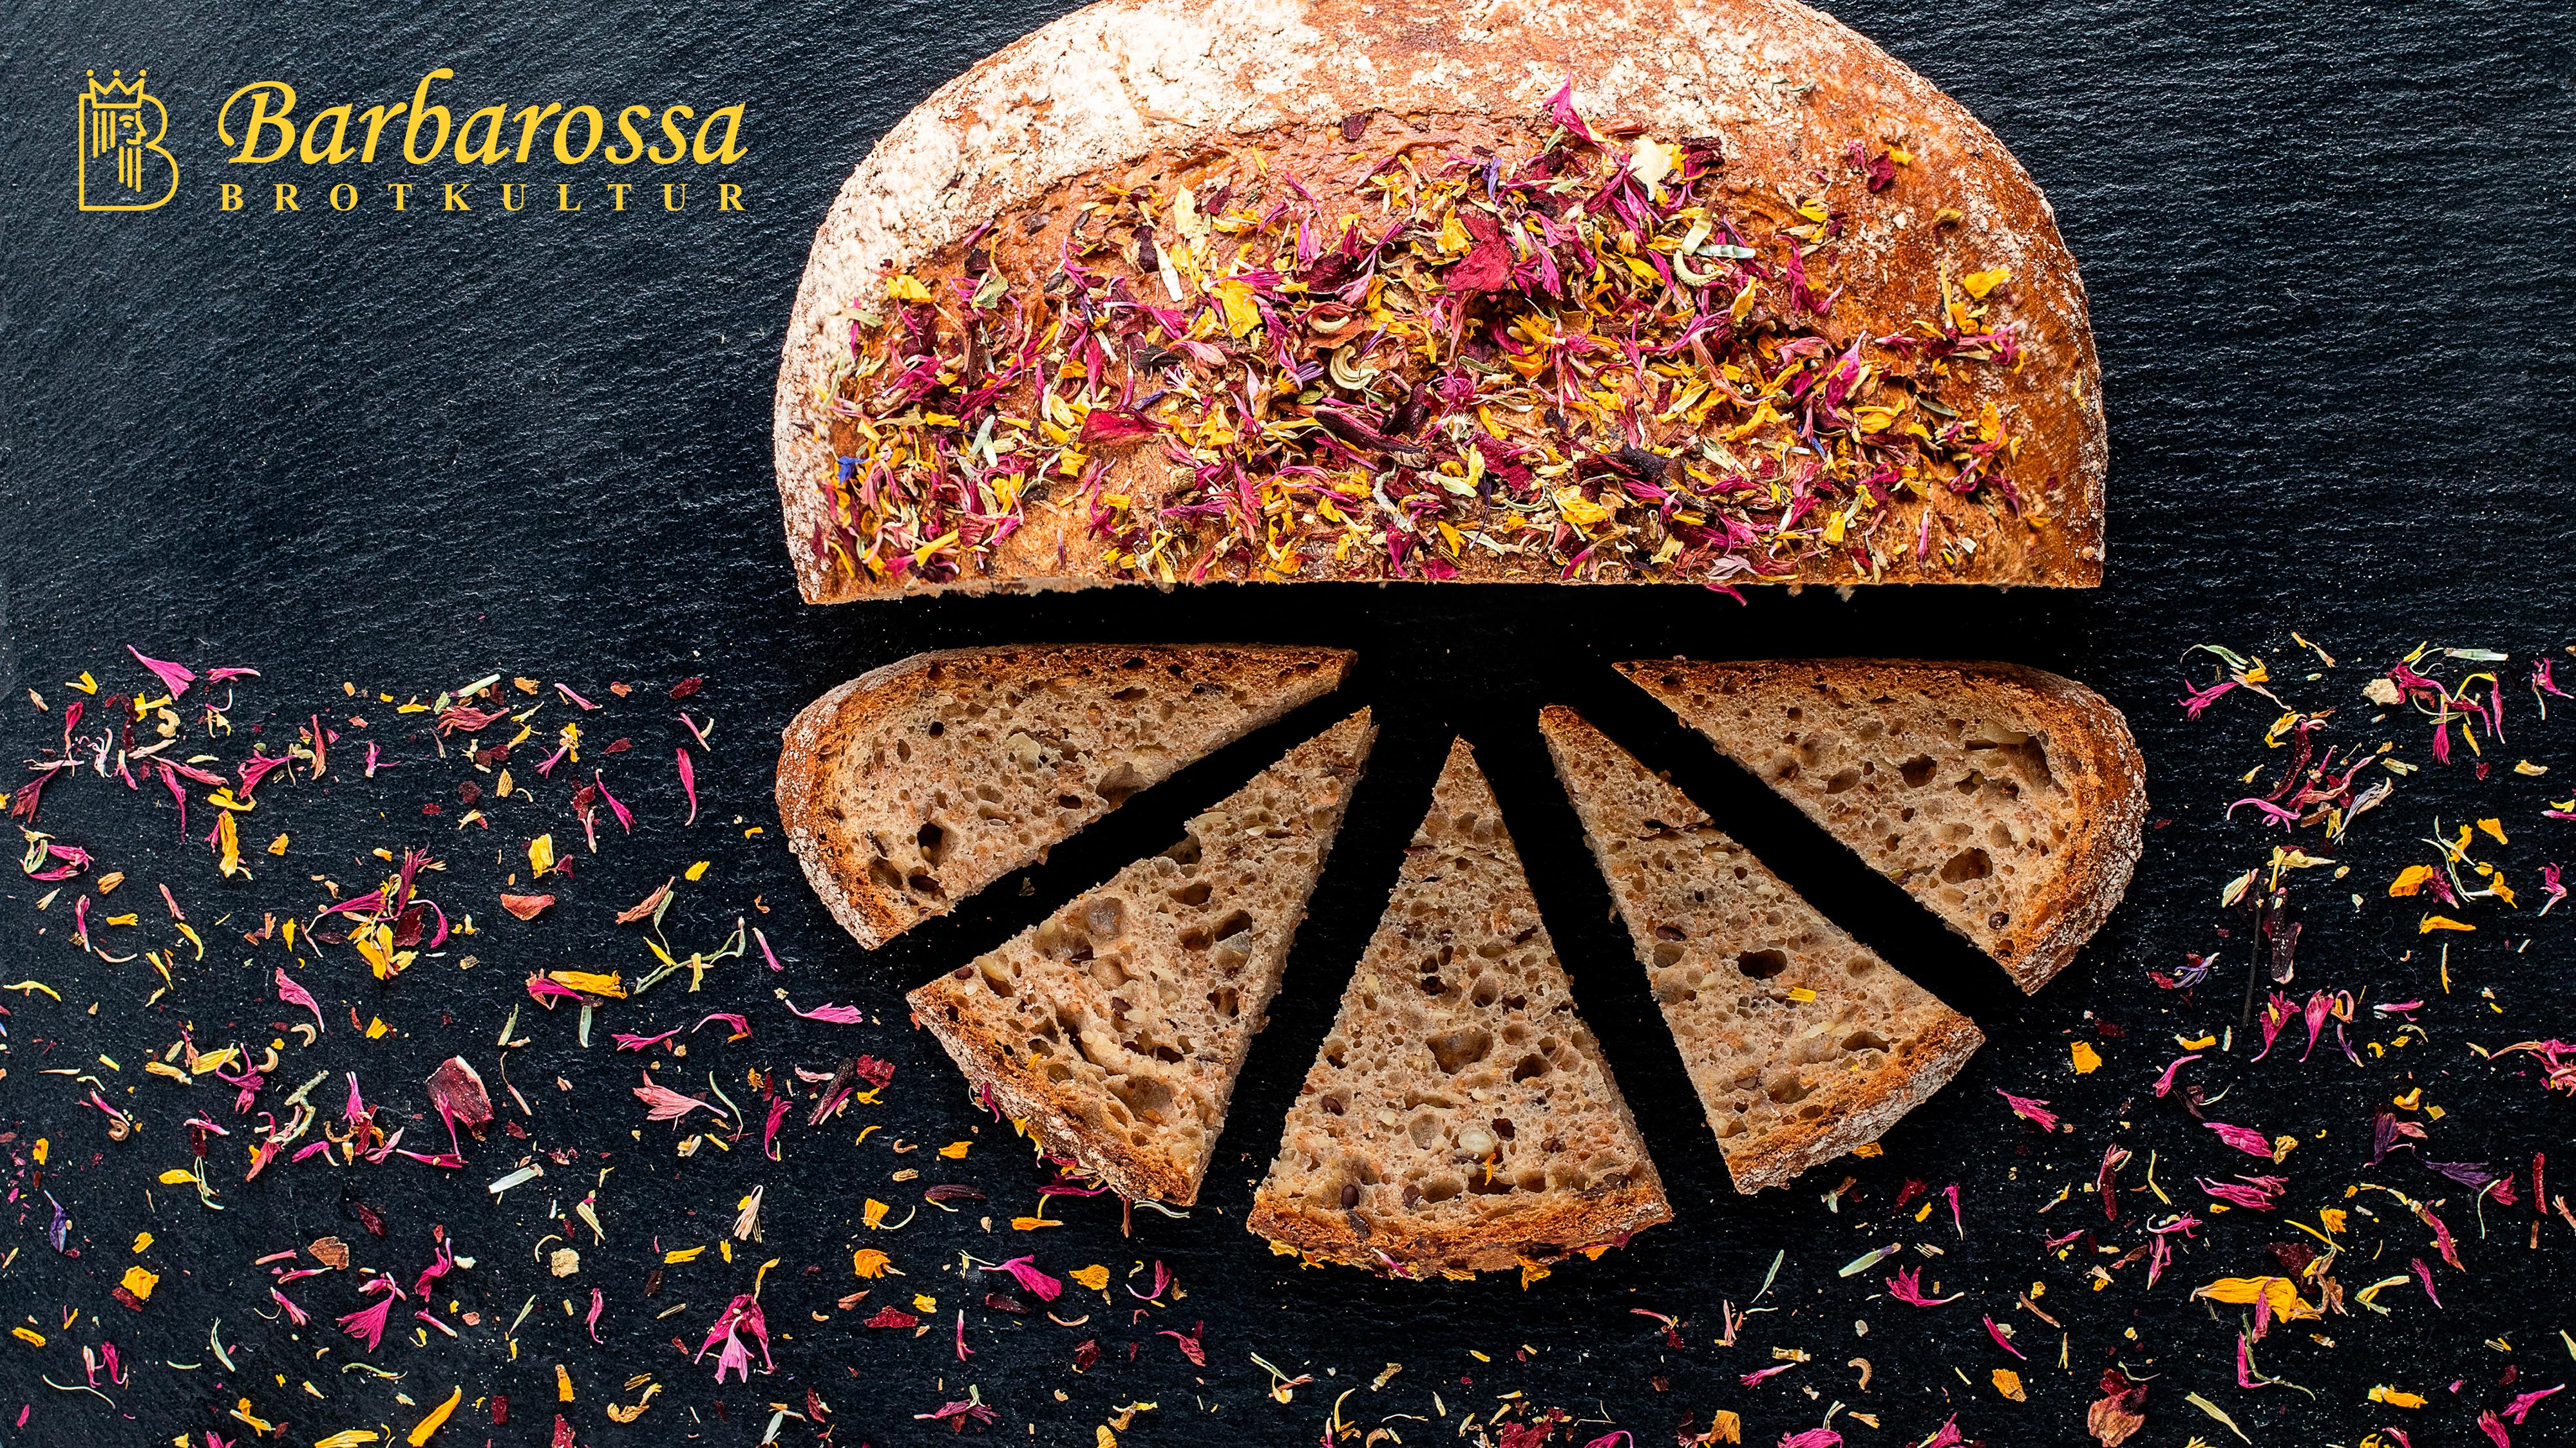 Barbarossa Bäckerei Blütenbrot © by ANTARES Pictures Kaiserslautern | Edgar Gerhards